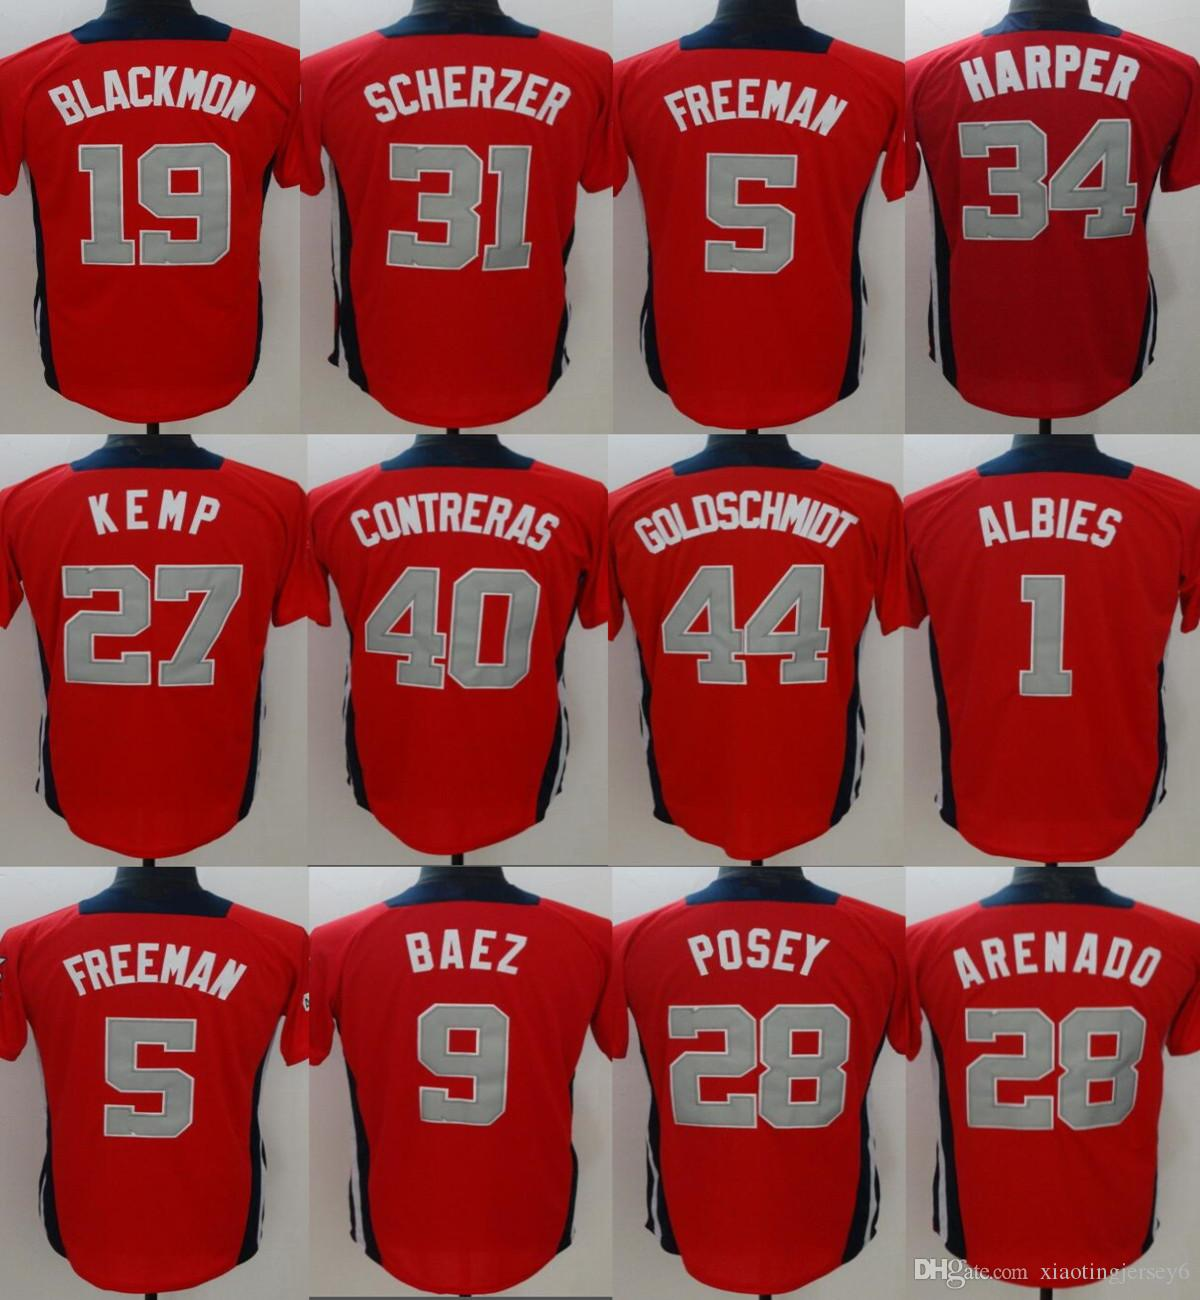 2018 Men 2018 All Star Jersey 27 Matt Kemp 1 Ozzie Albies 5 Freddie Freeman  9 Javier Baez Baseball Jerseys Red Size  M 3XL From Xiaotingjersey6 fc40026c3f1